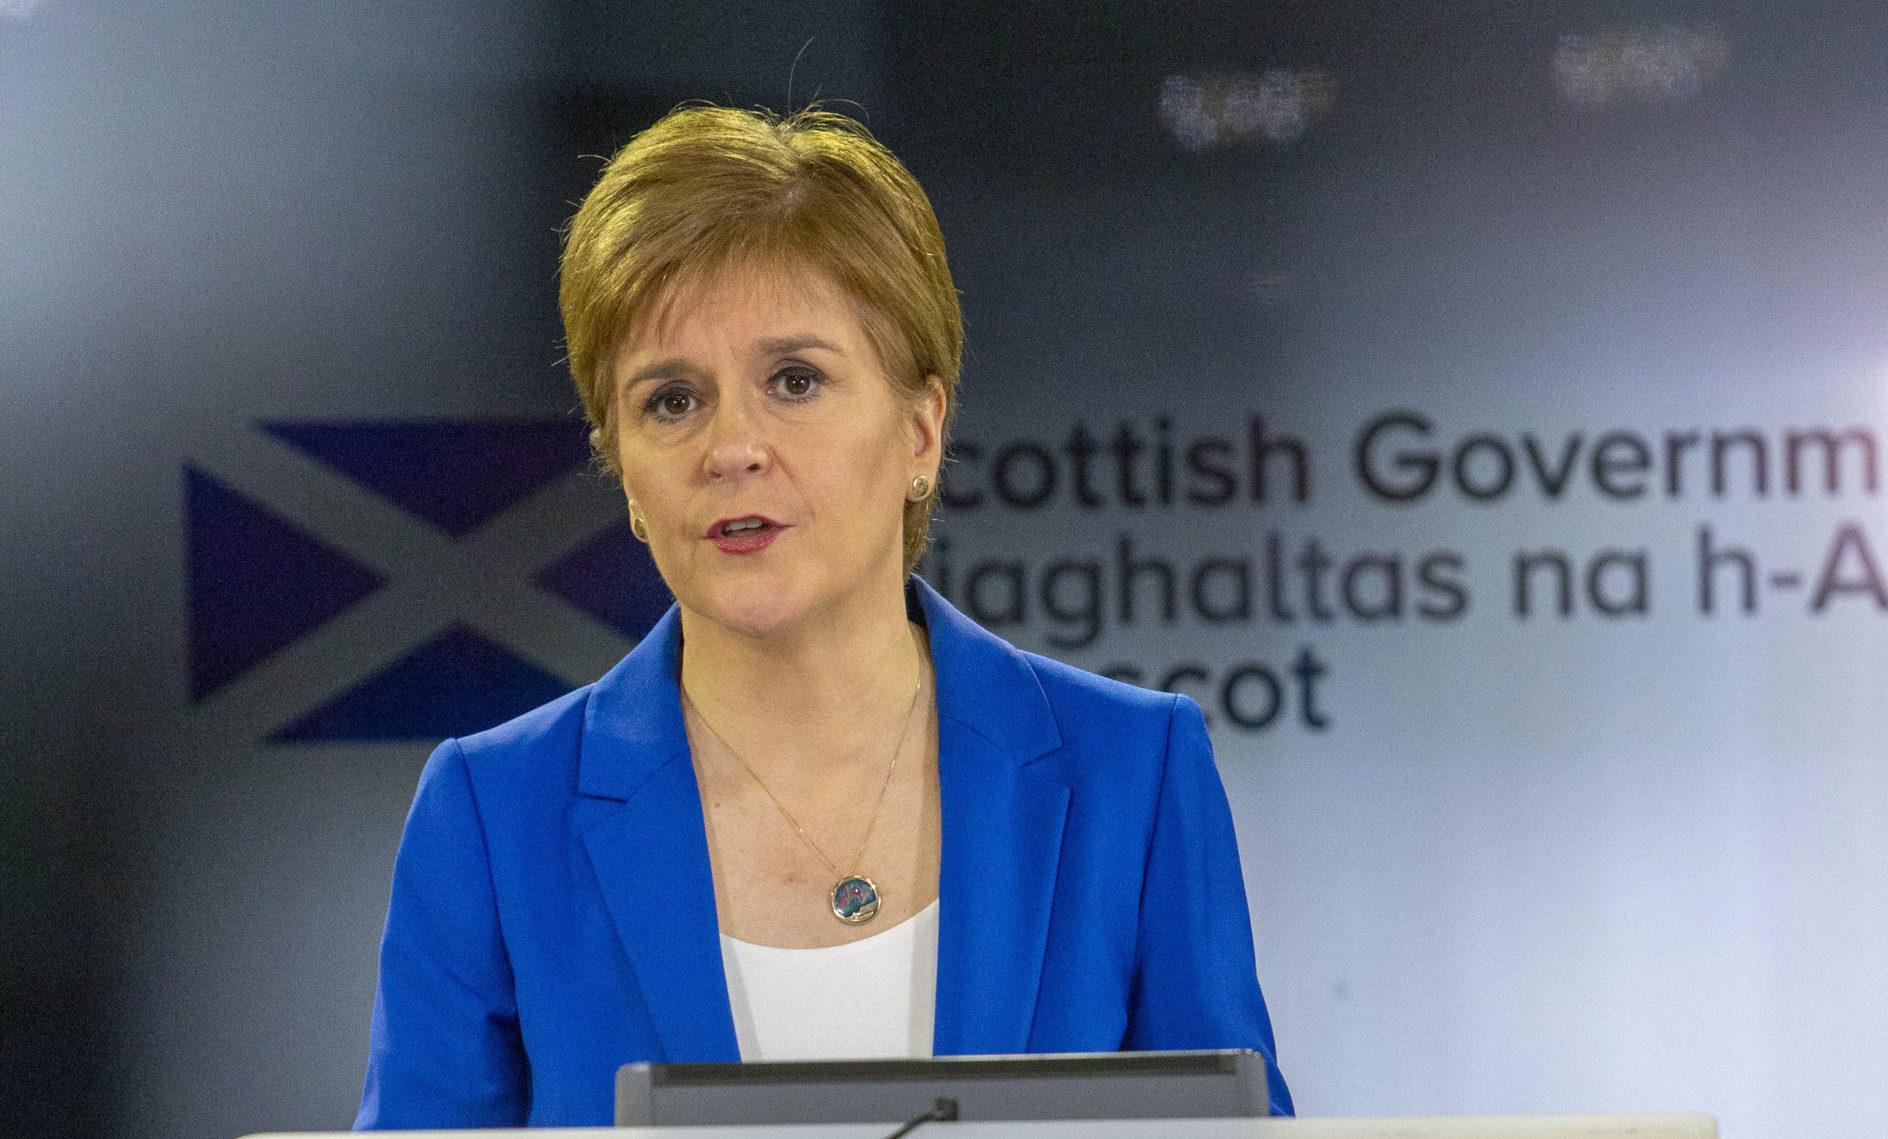 Scotland's First Minister Nicola Sturgeon.